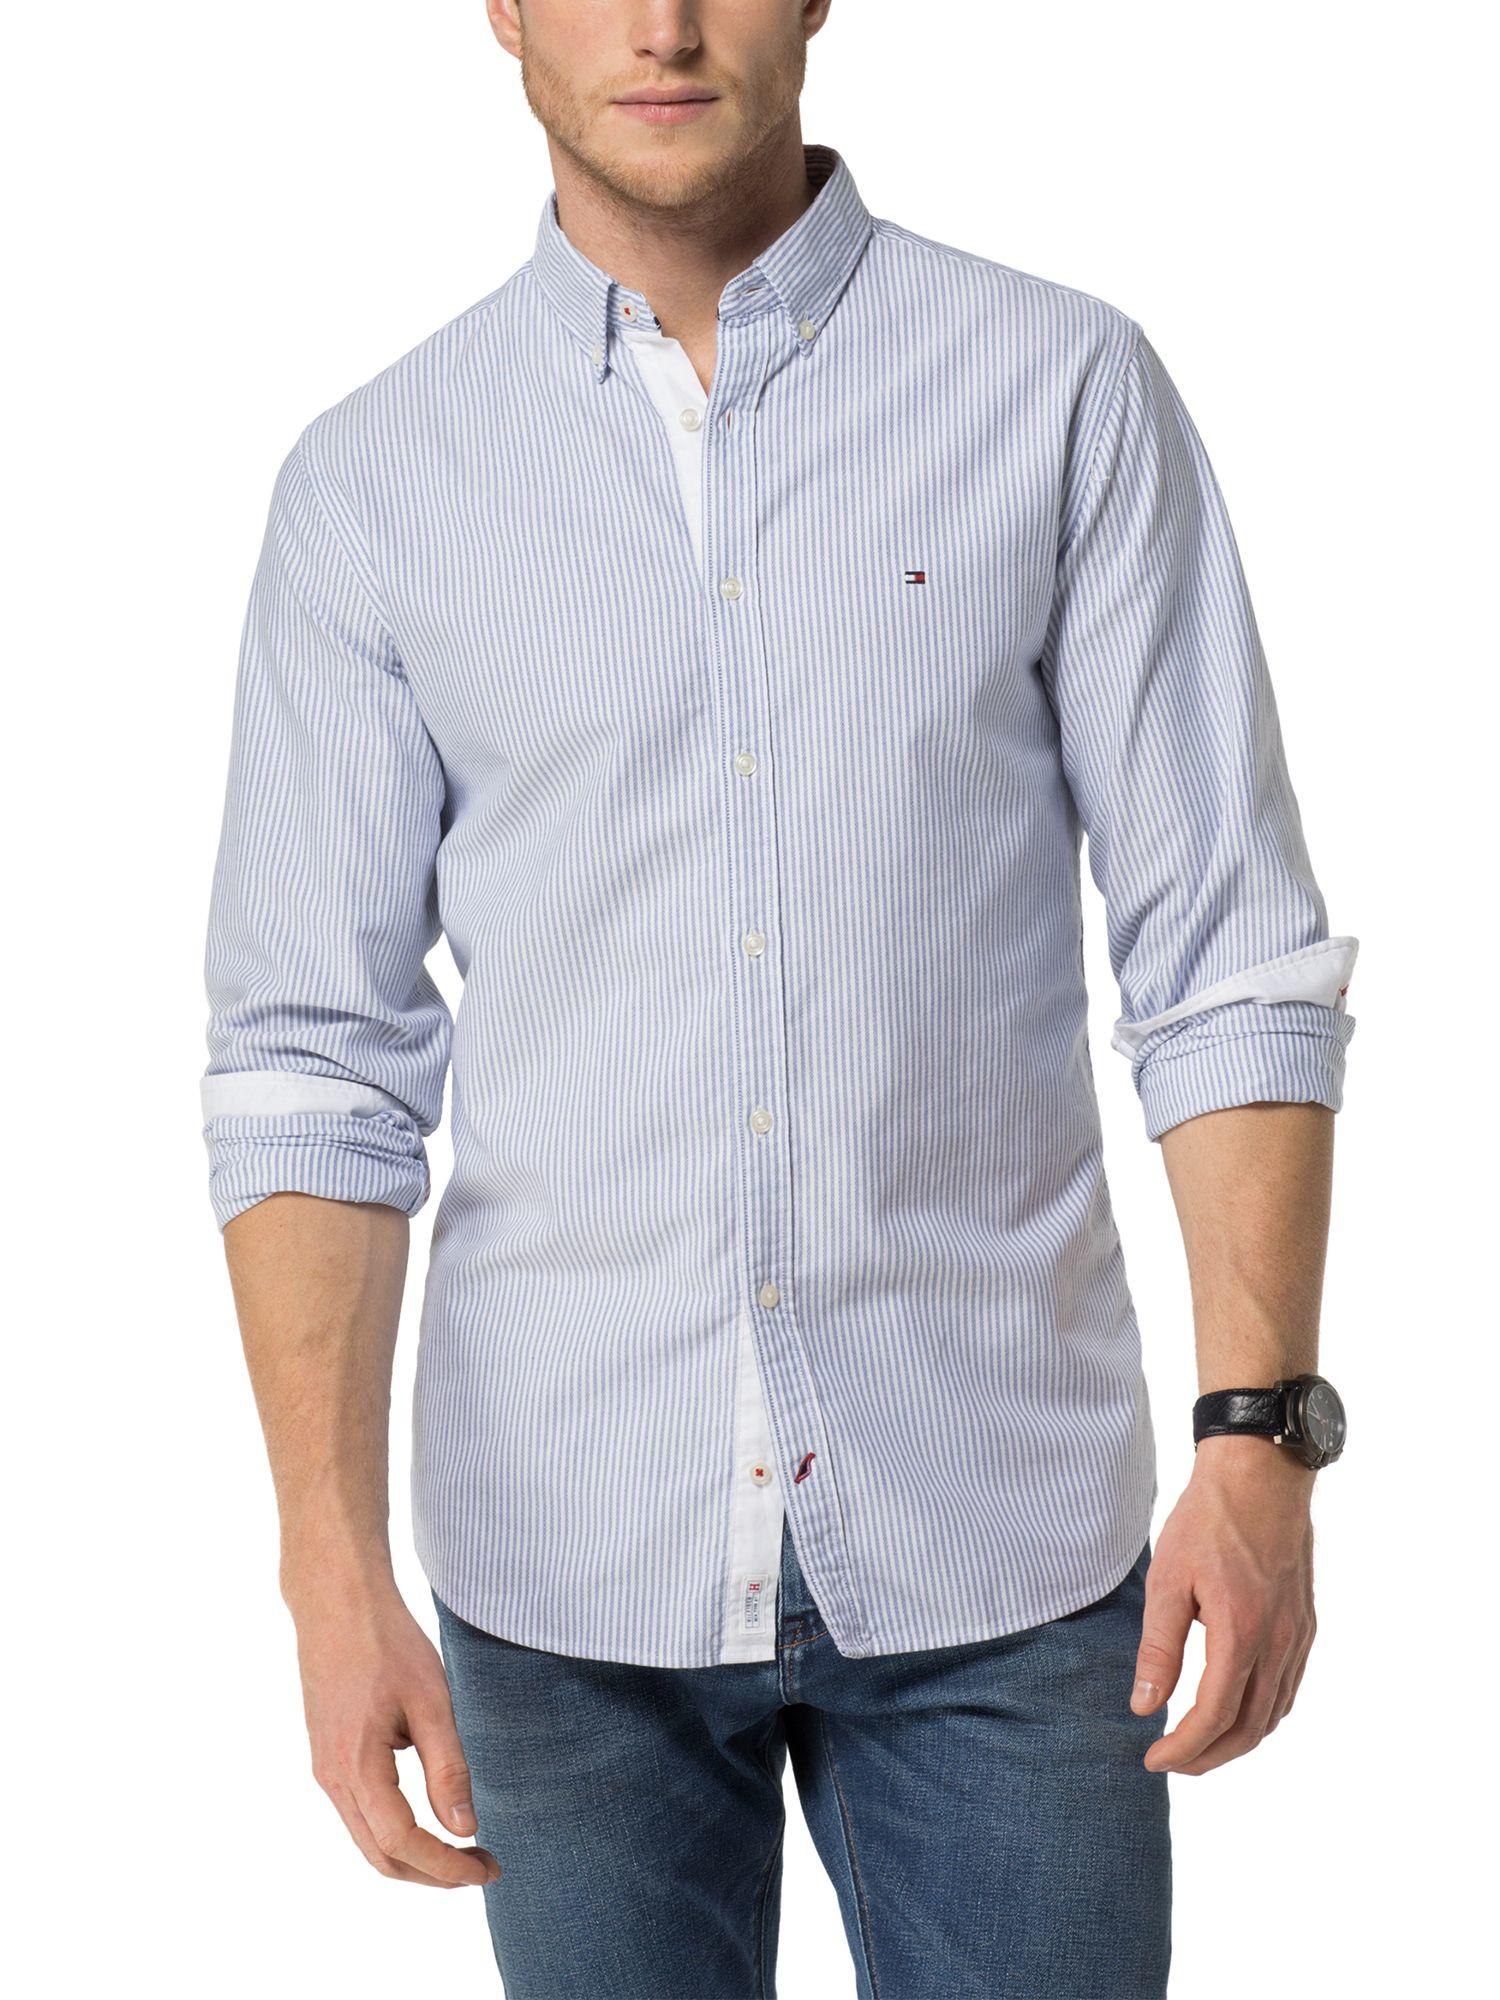 Lyst tommy hilfiger ithaca stripe shirt in blue for men for Tommy hilfiger fitzgerald striped shirt